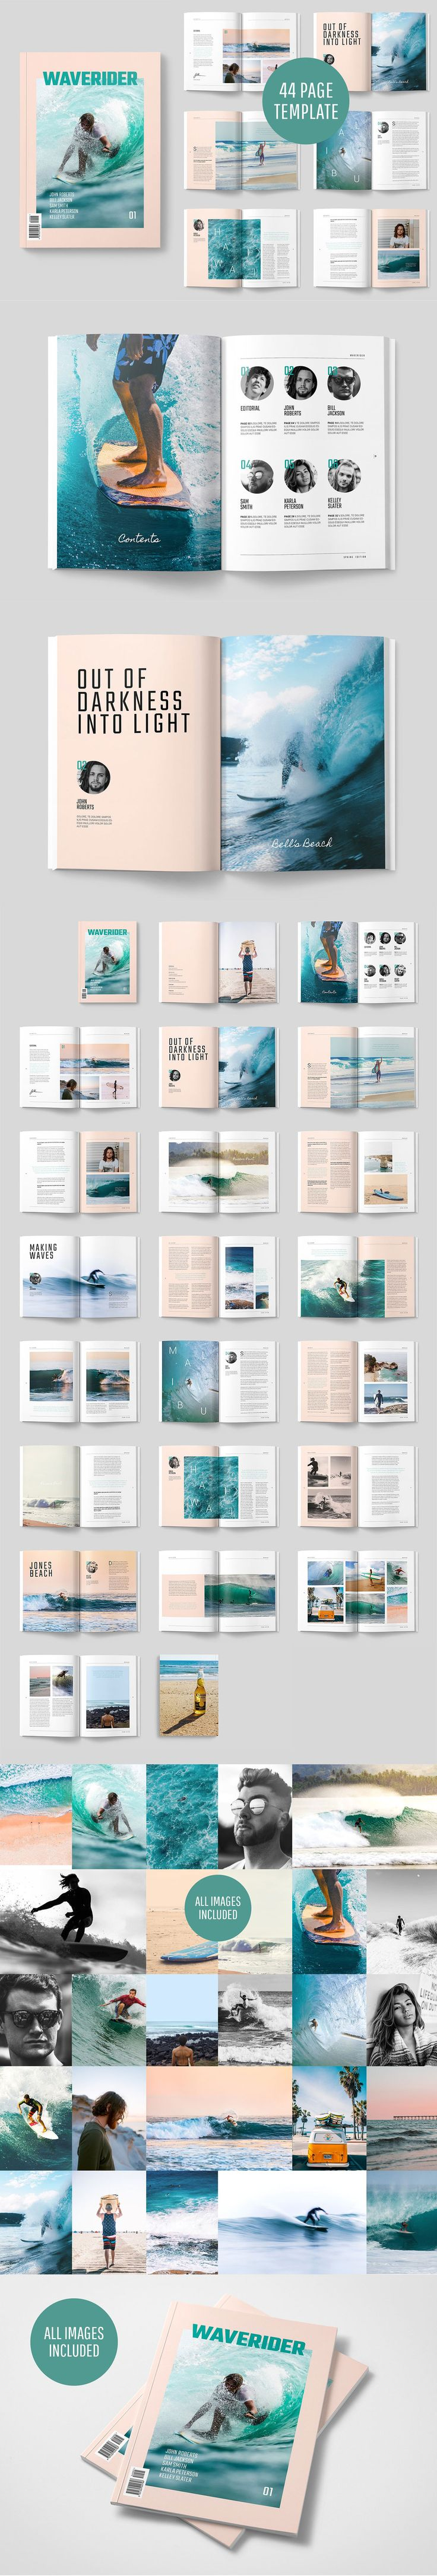 Waverider magazine